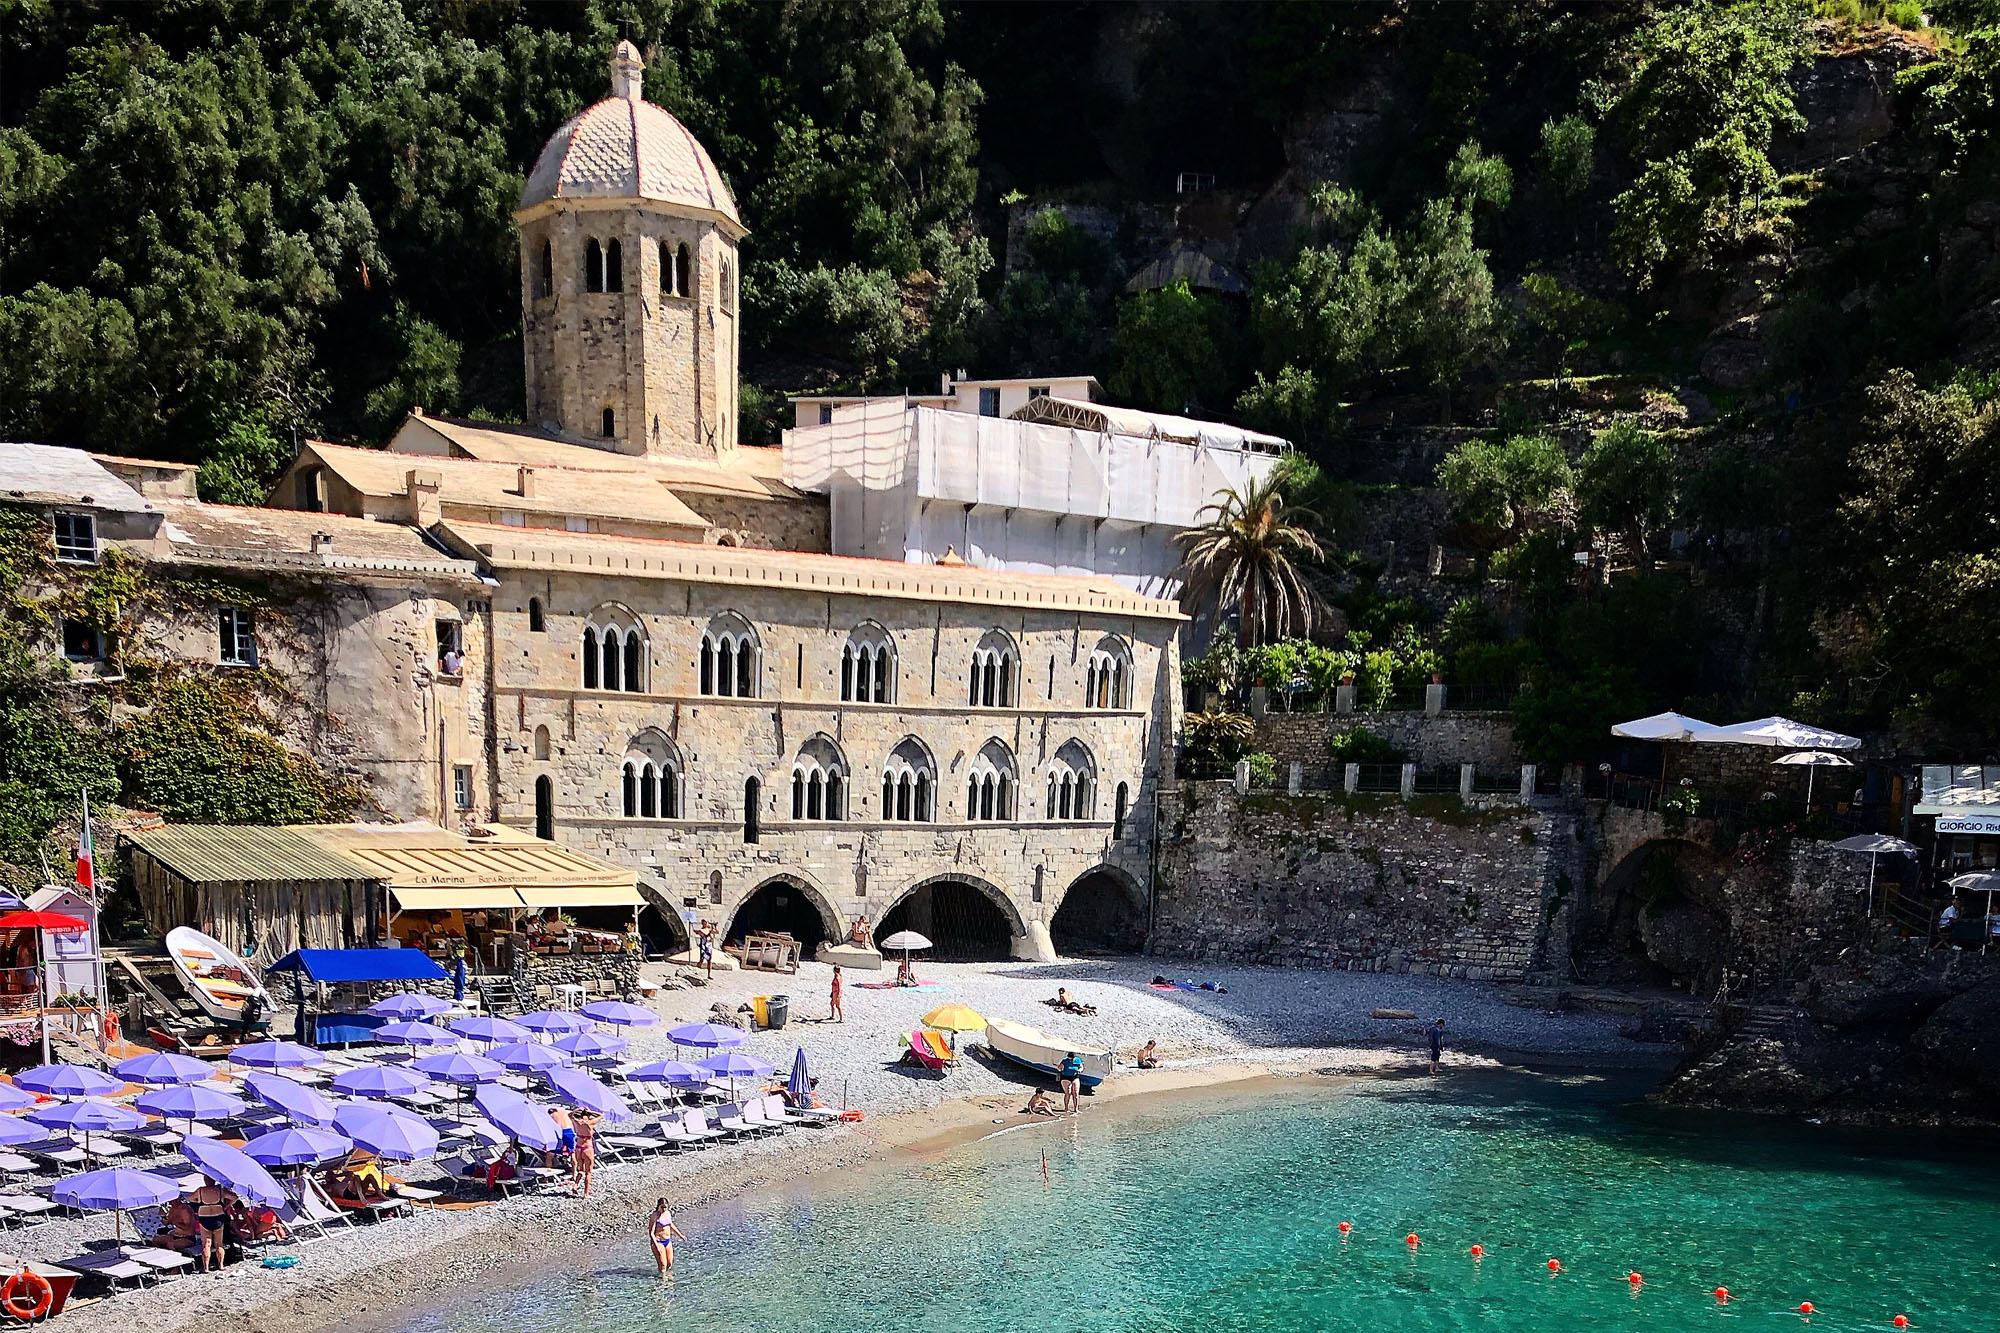 Cesare Charter Portofino - Tour Due Golfi, San Fruttuoso